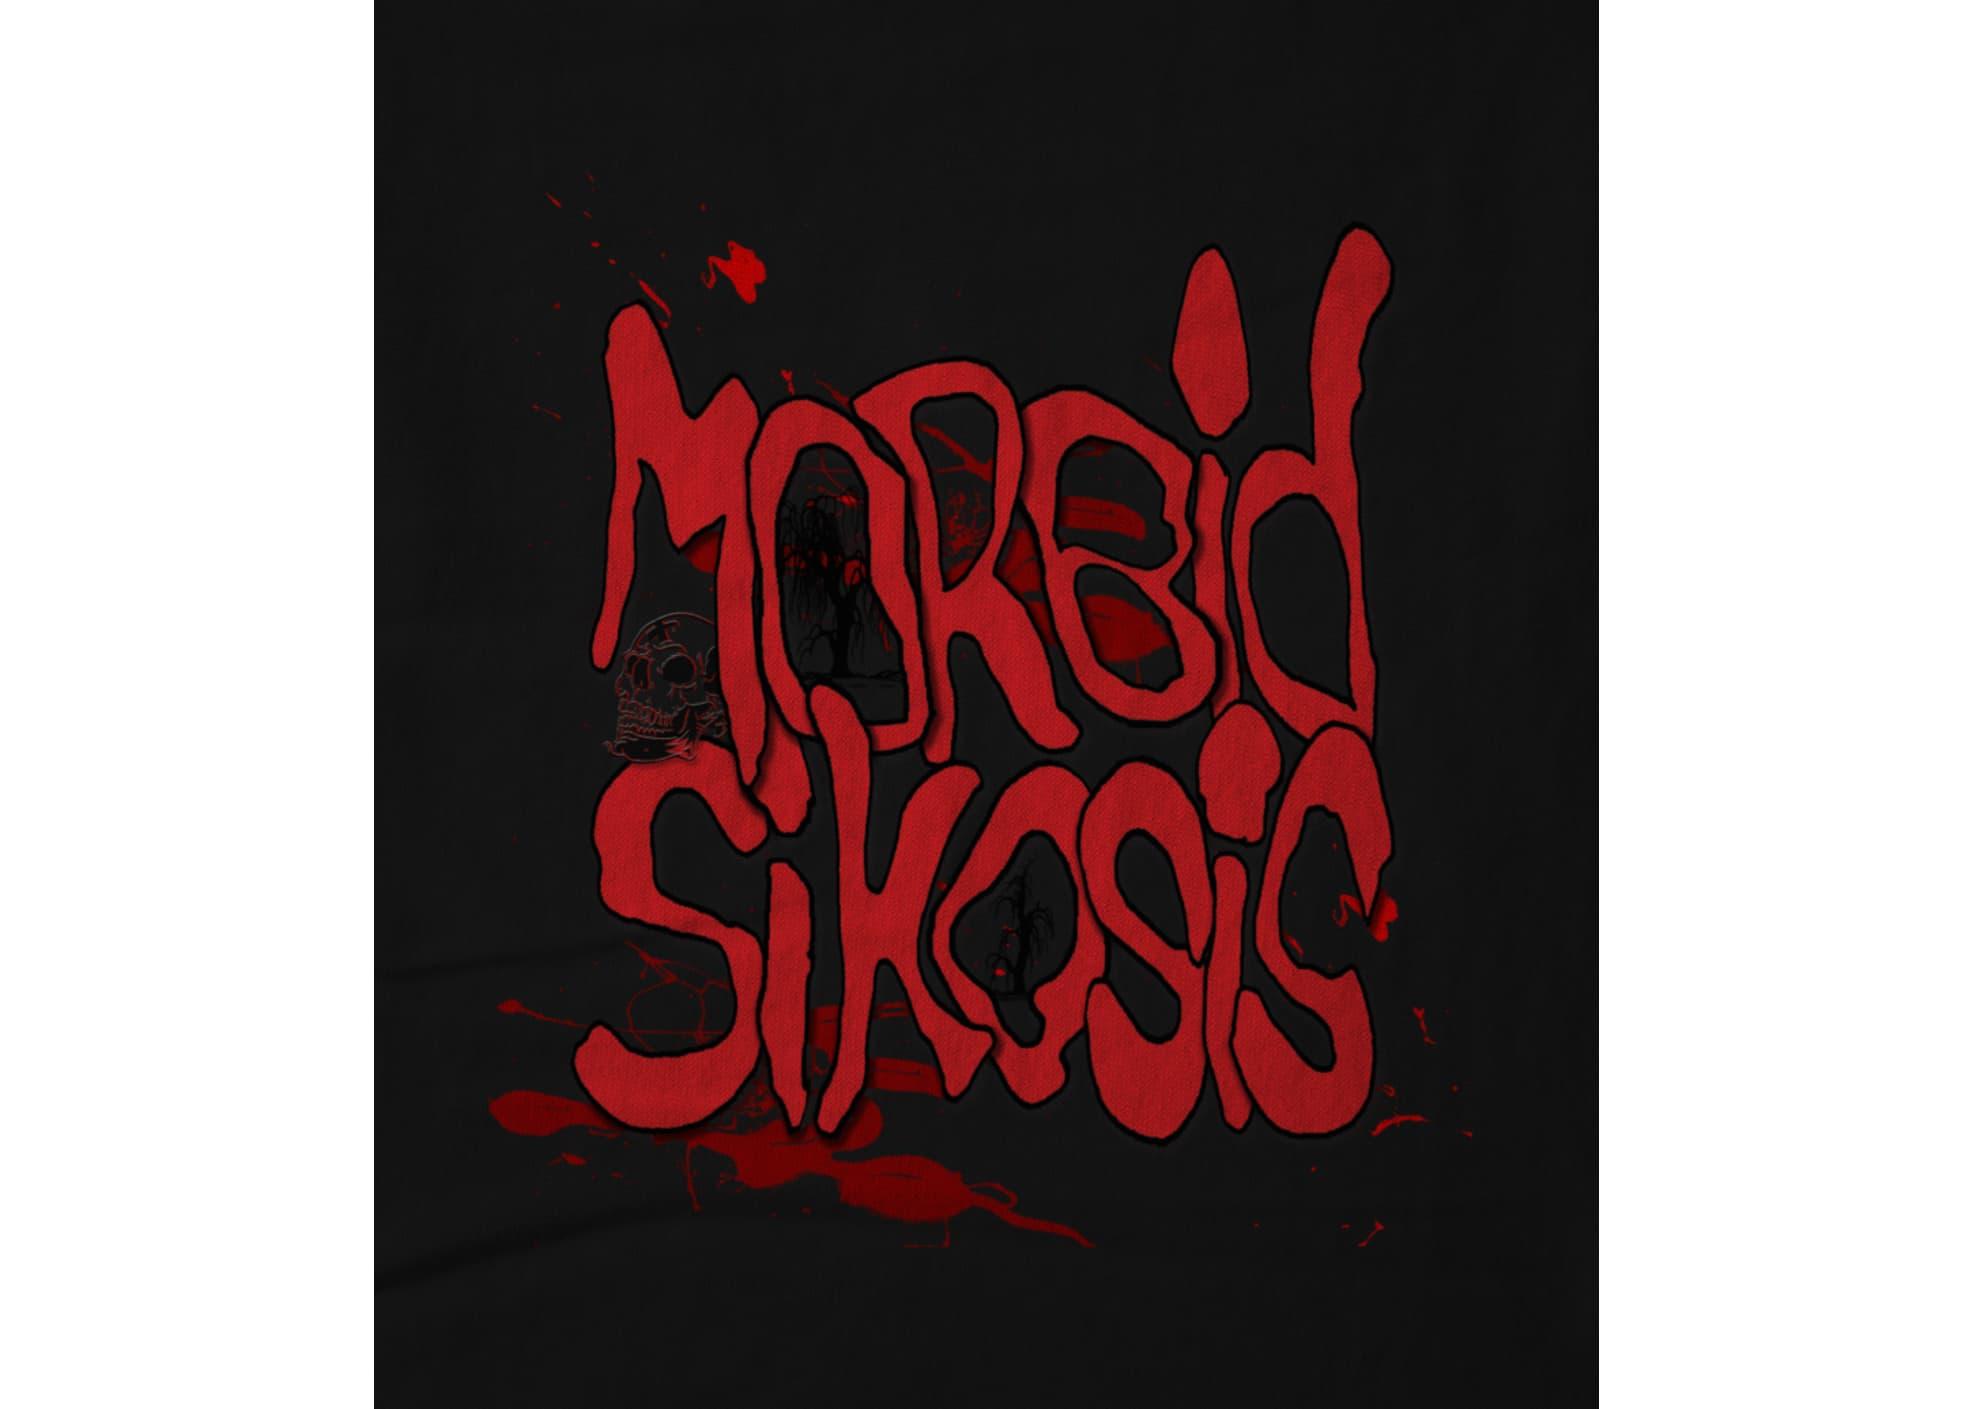 Morbid sikosis morbid  black  1595800572